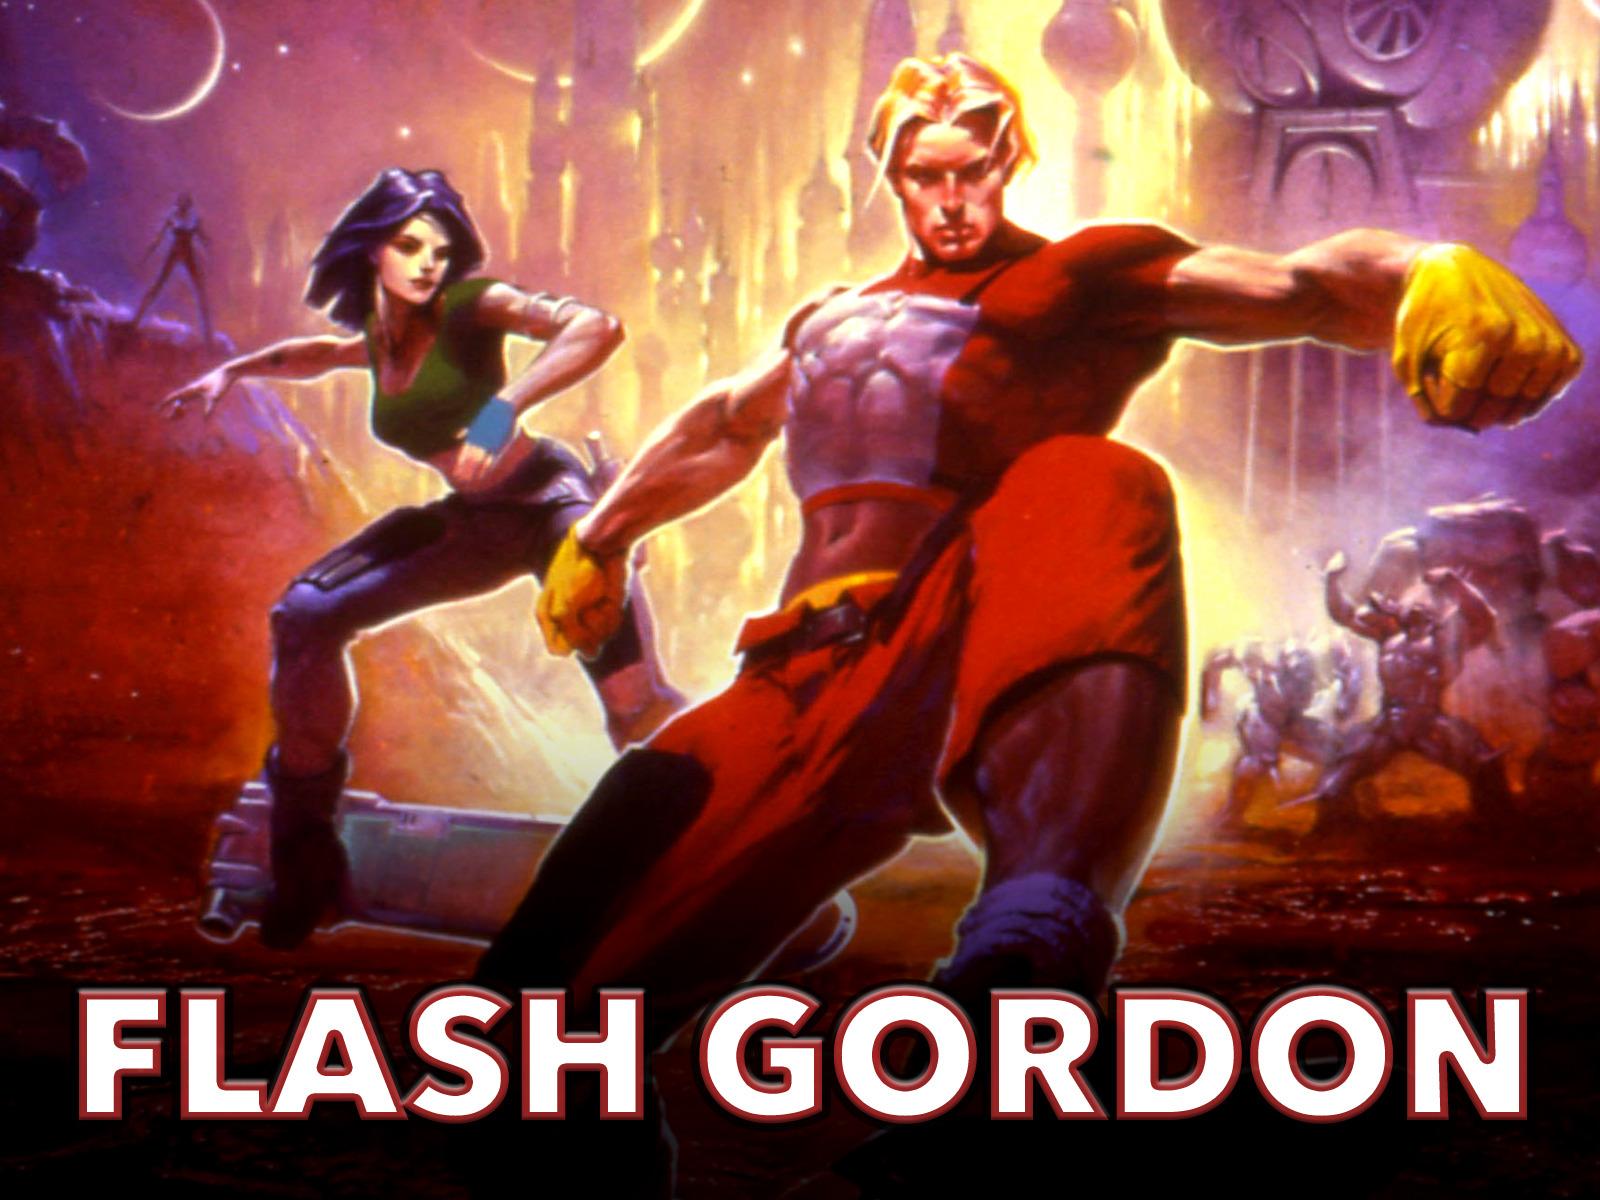 Watch flash gordon season 1 episode 26: heat wave on syndicated.